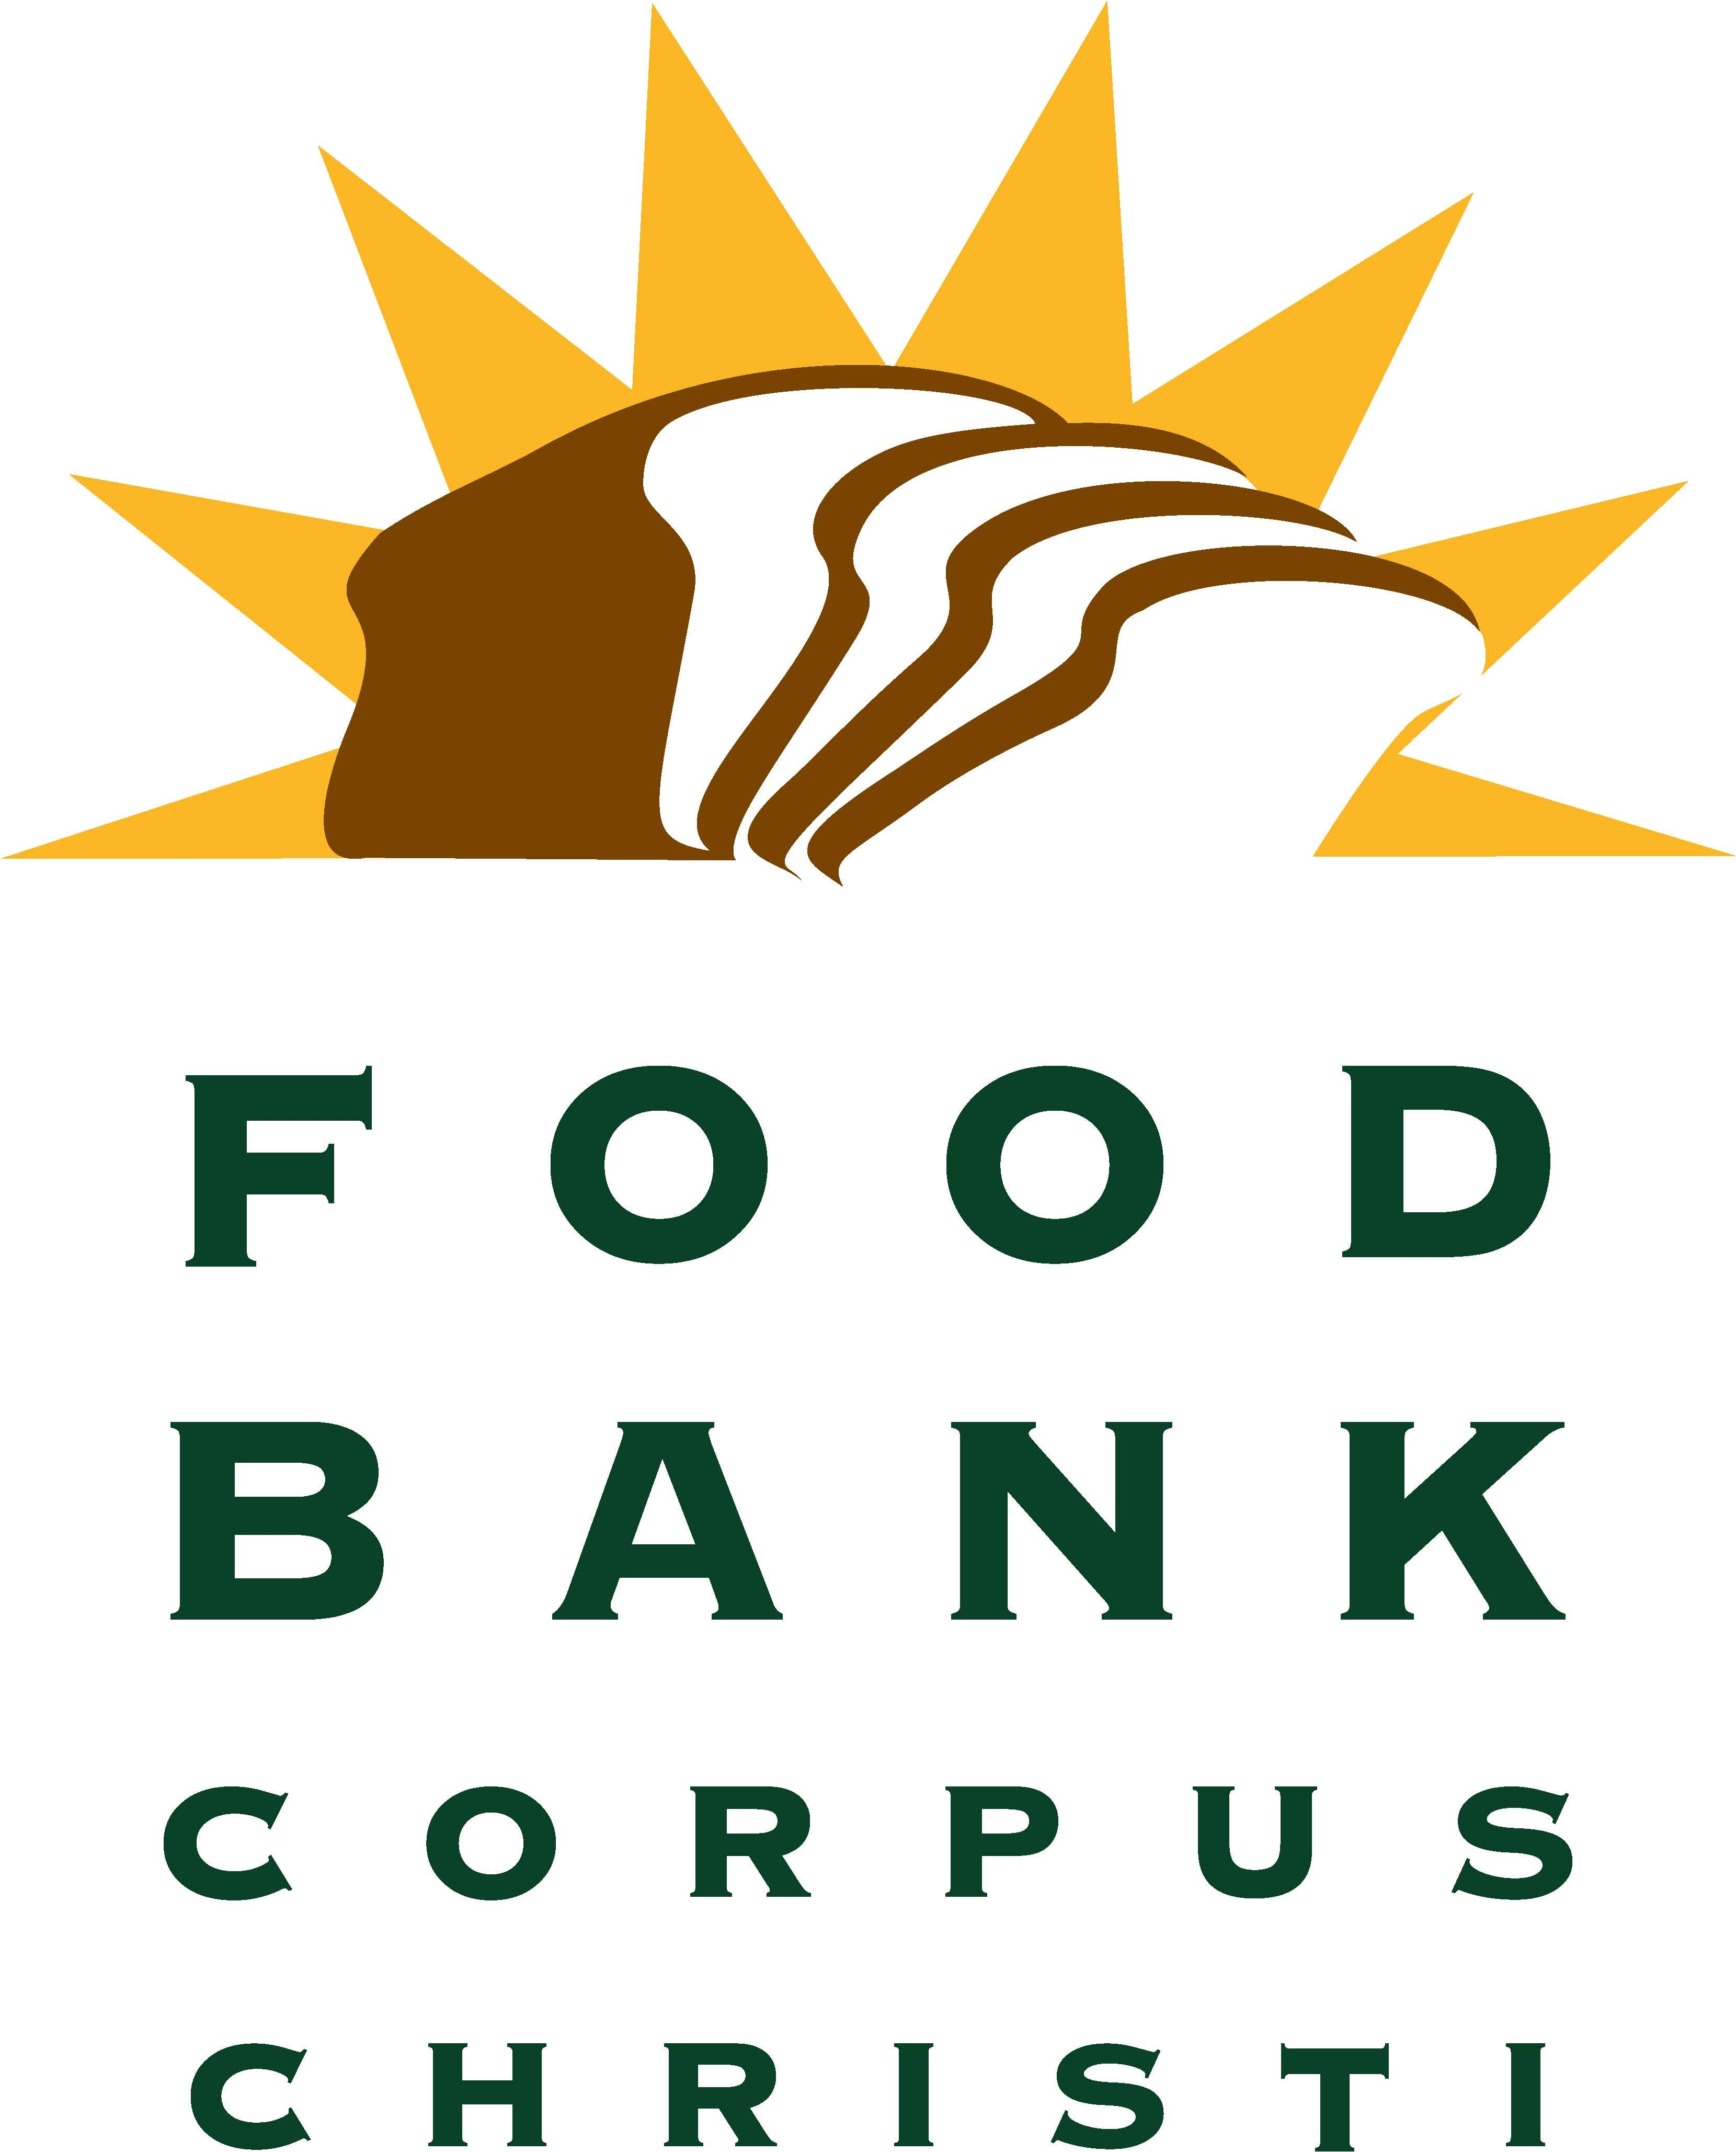 food bank logo Google Search Food bank, Banks logo, Food